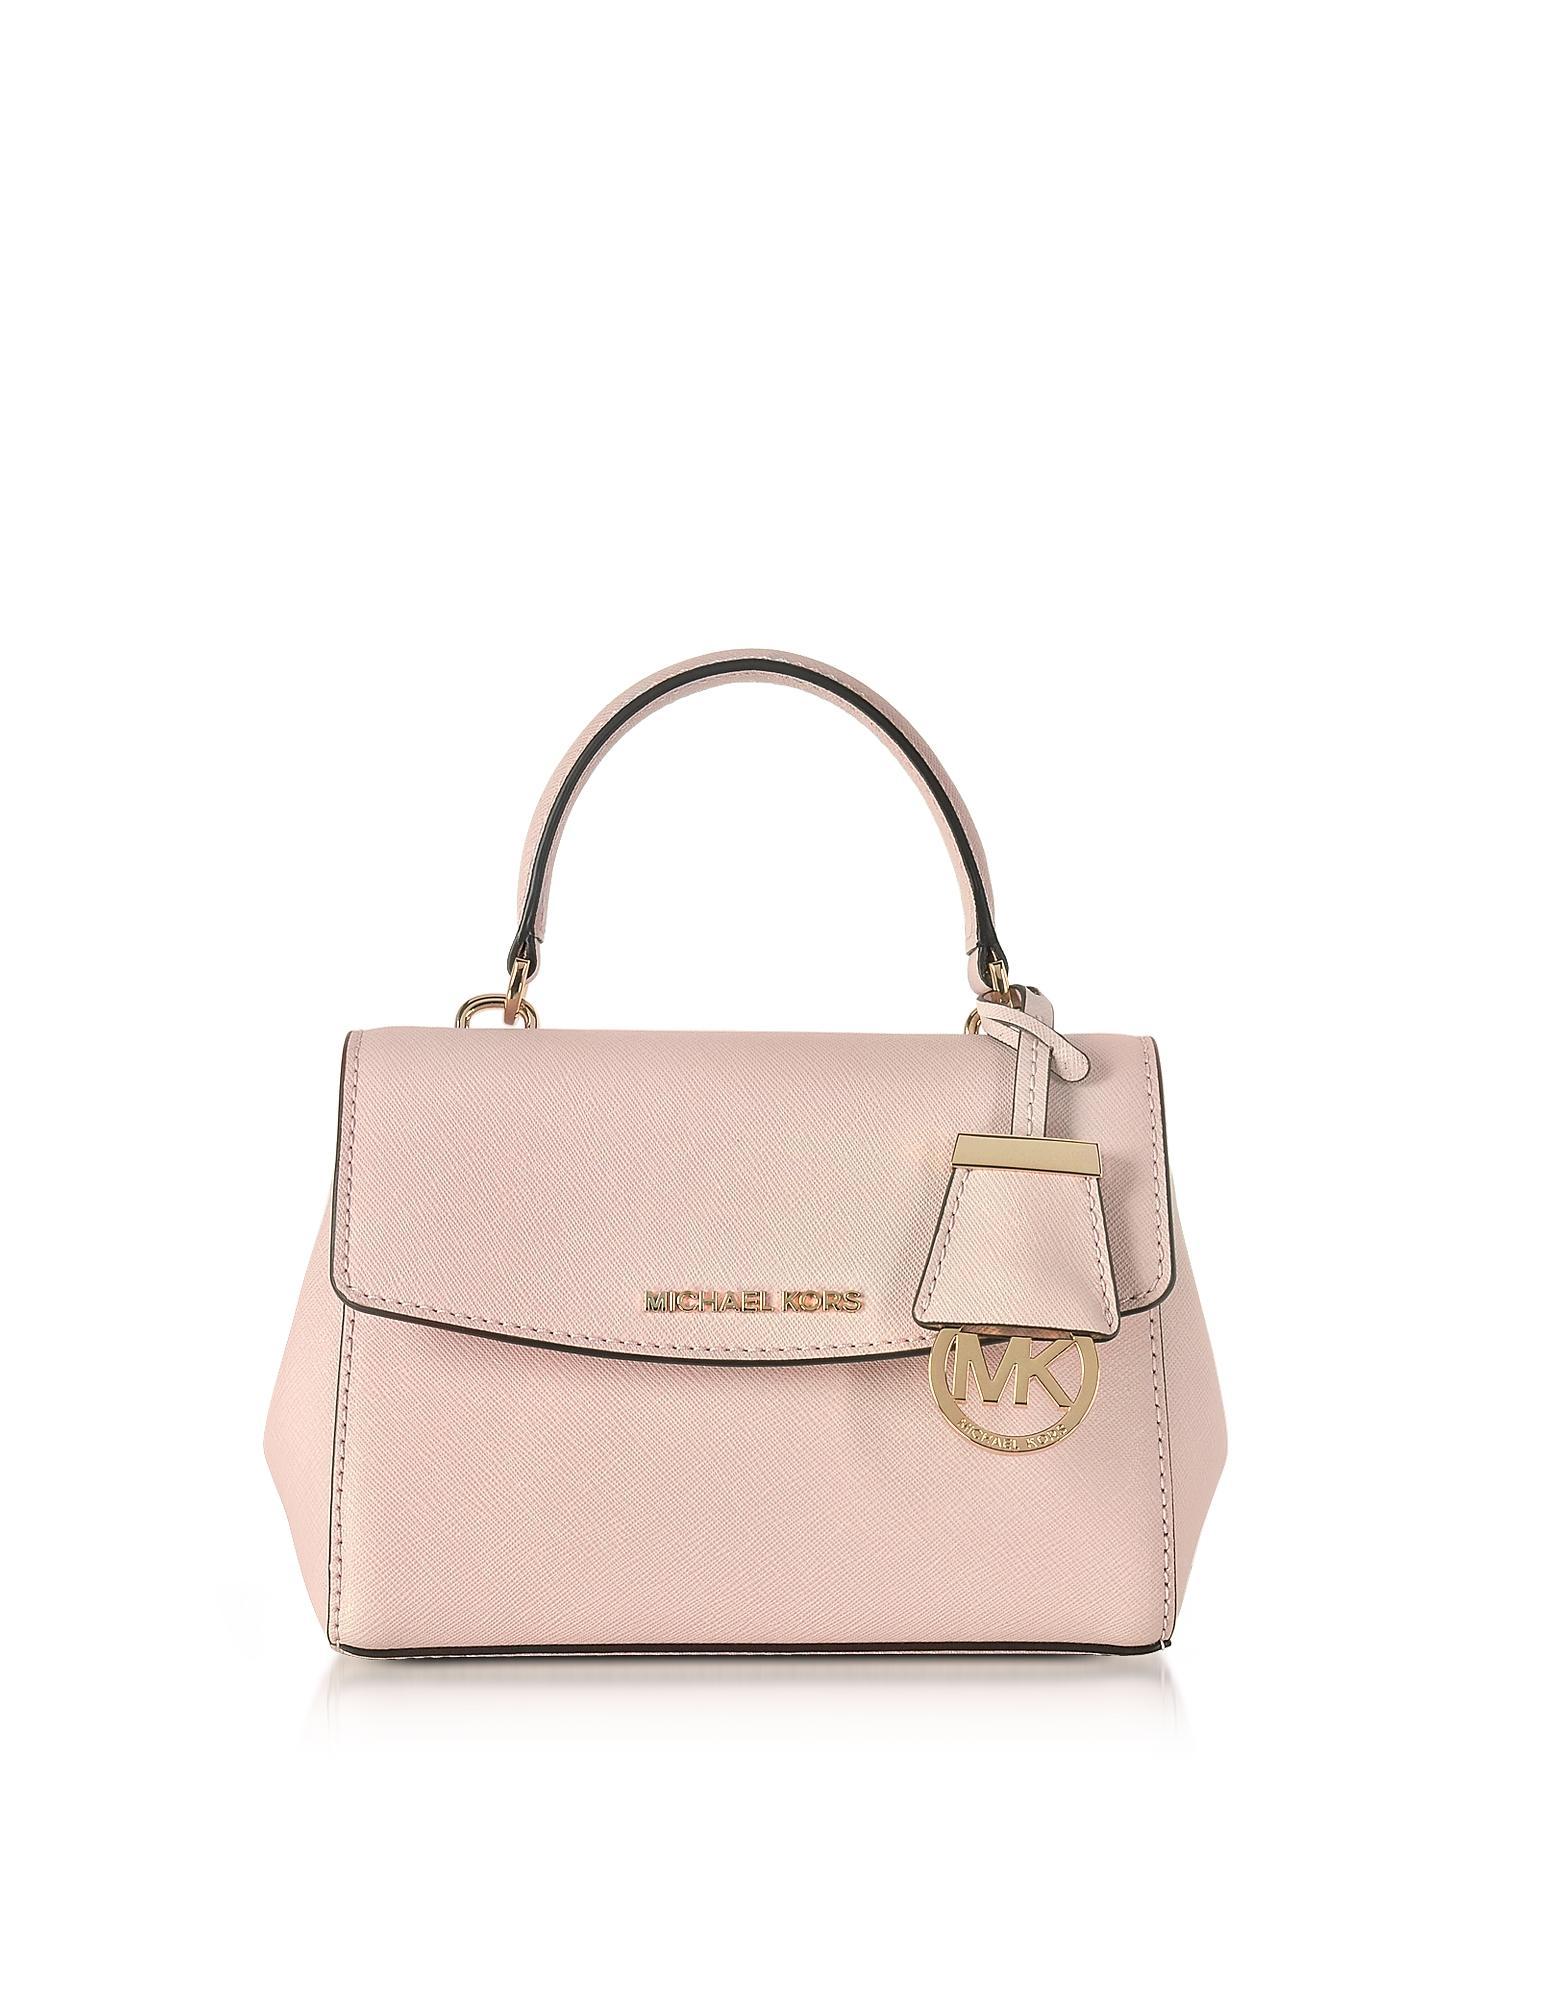 dd436901c269 Michael Kors Ava Soft Pink Saffiano Leather Xs Crossbody Bag in Pink ...